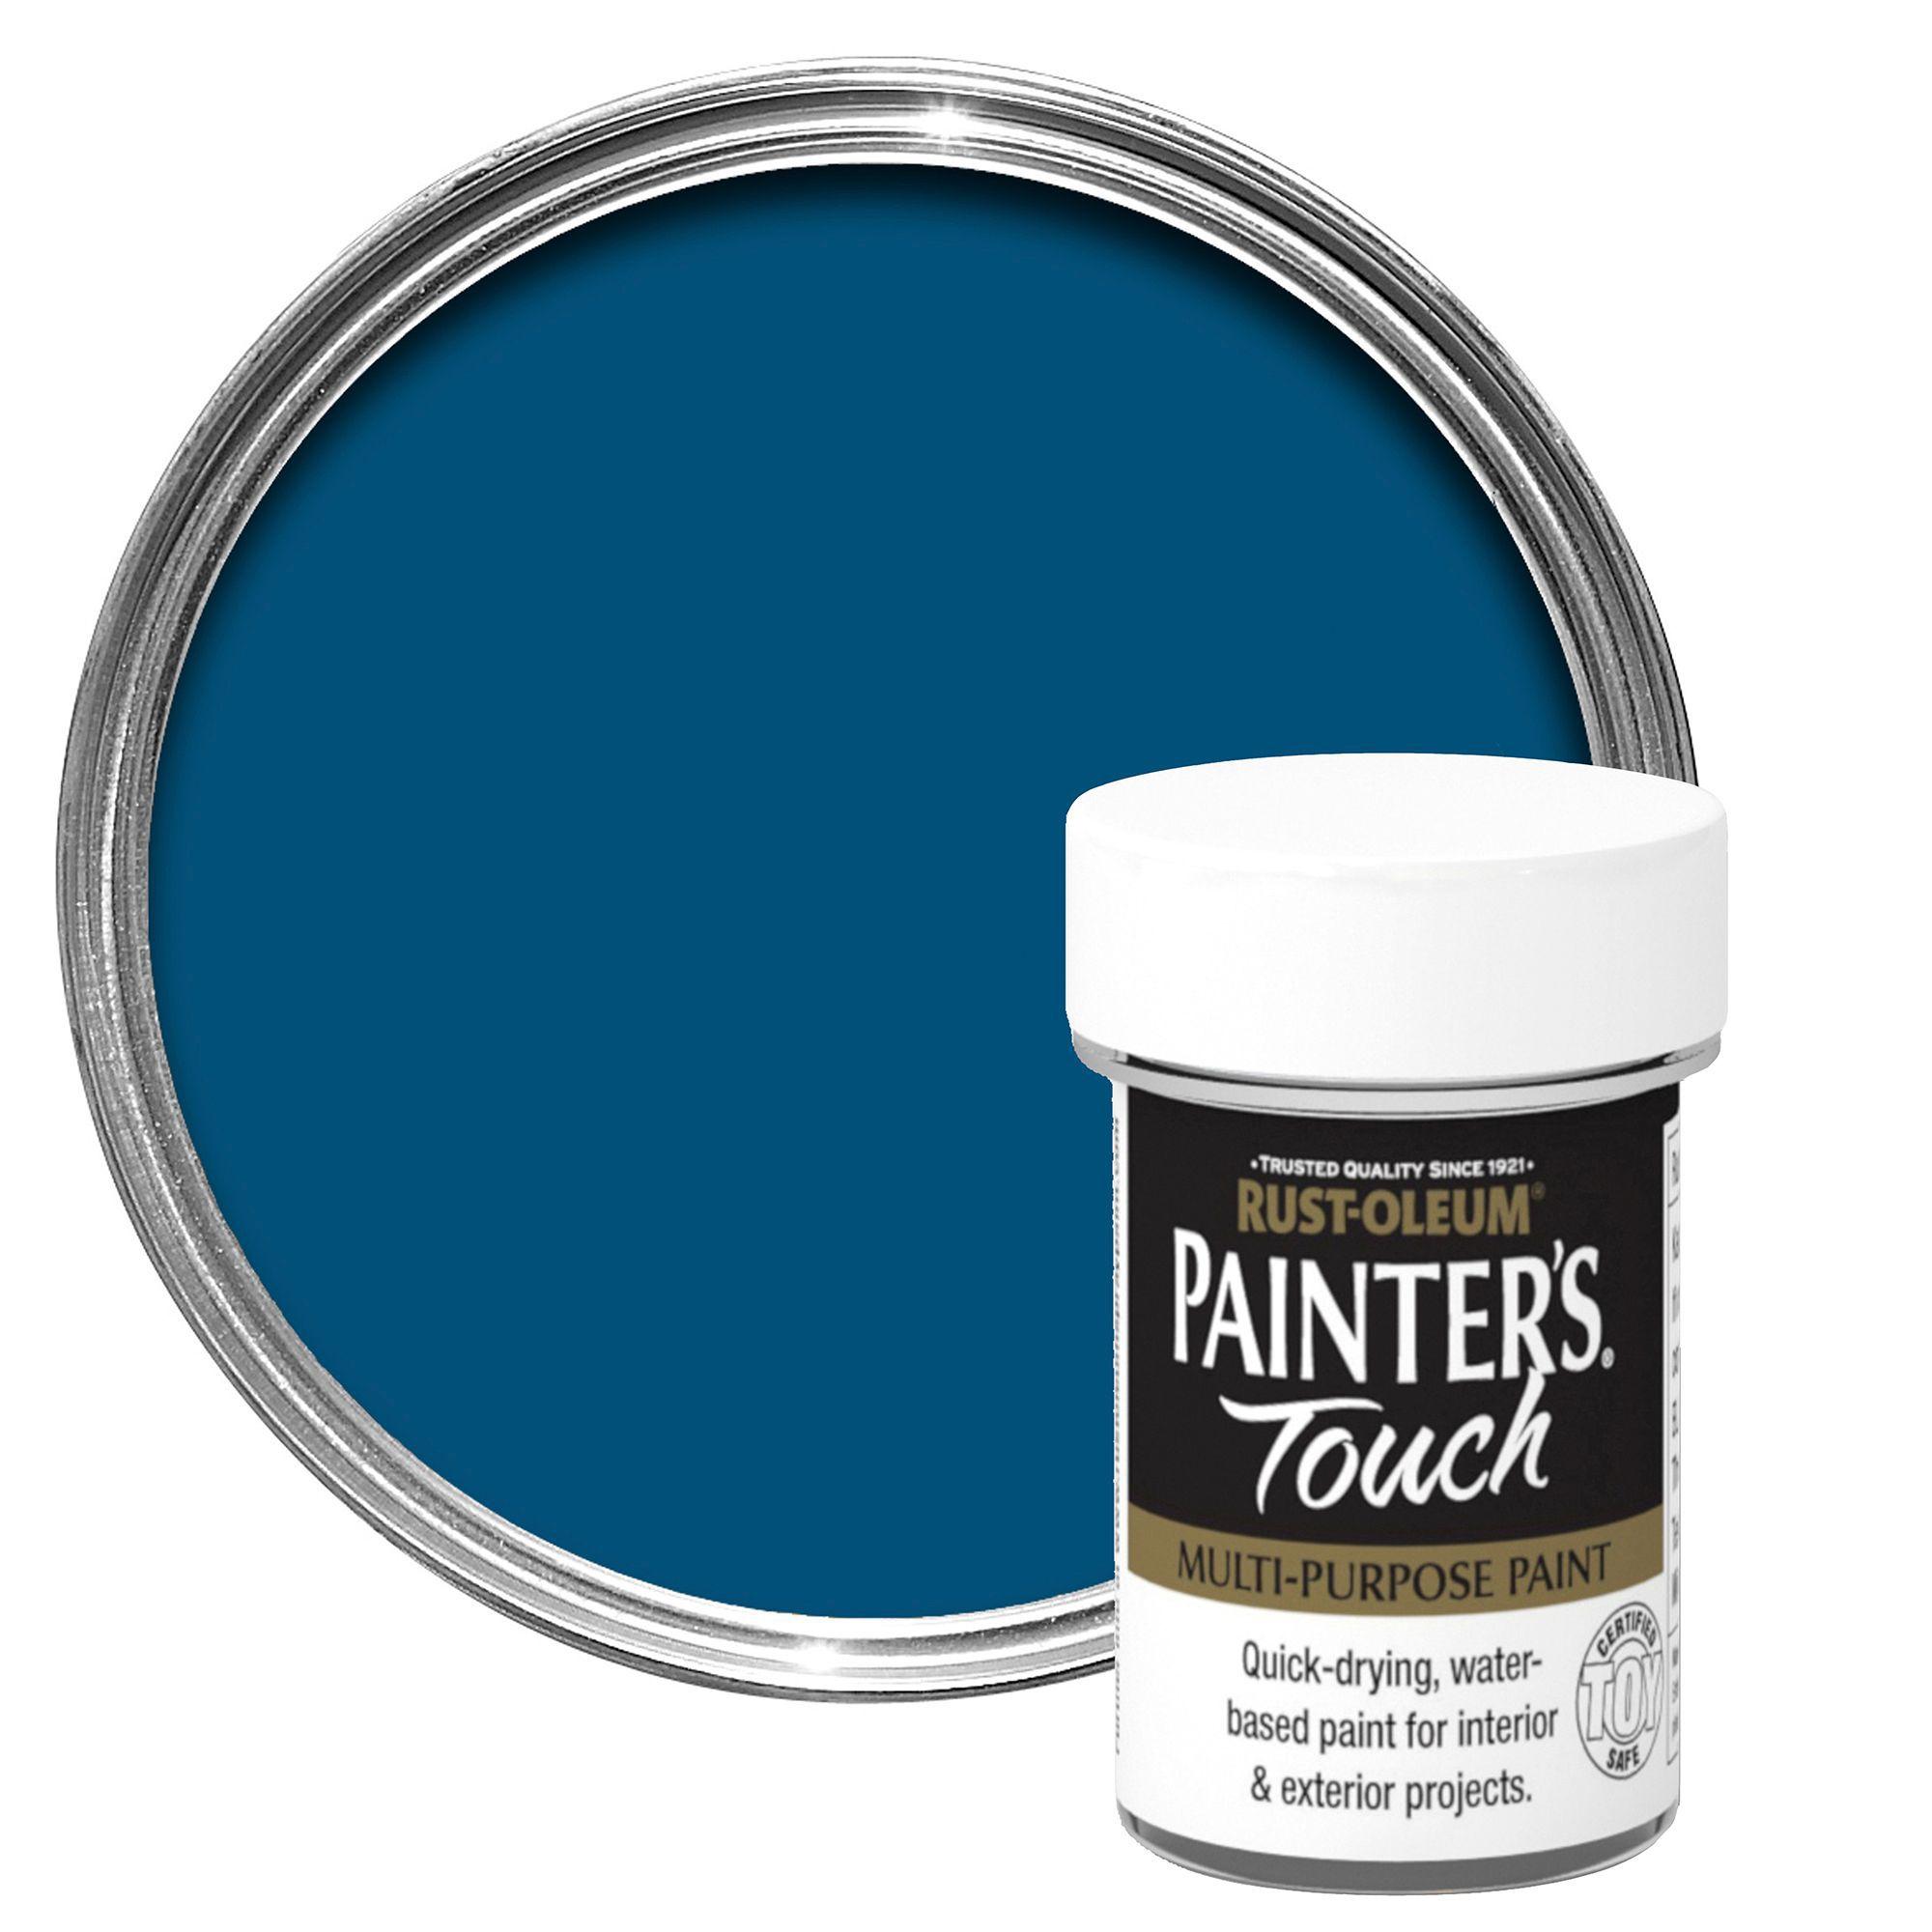 Rust-Oleum Painter's Touch Interior & Exterior Sea Blue Gloss Multipurpose Paint 20ml